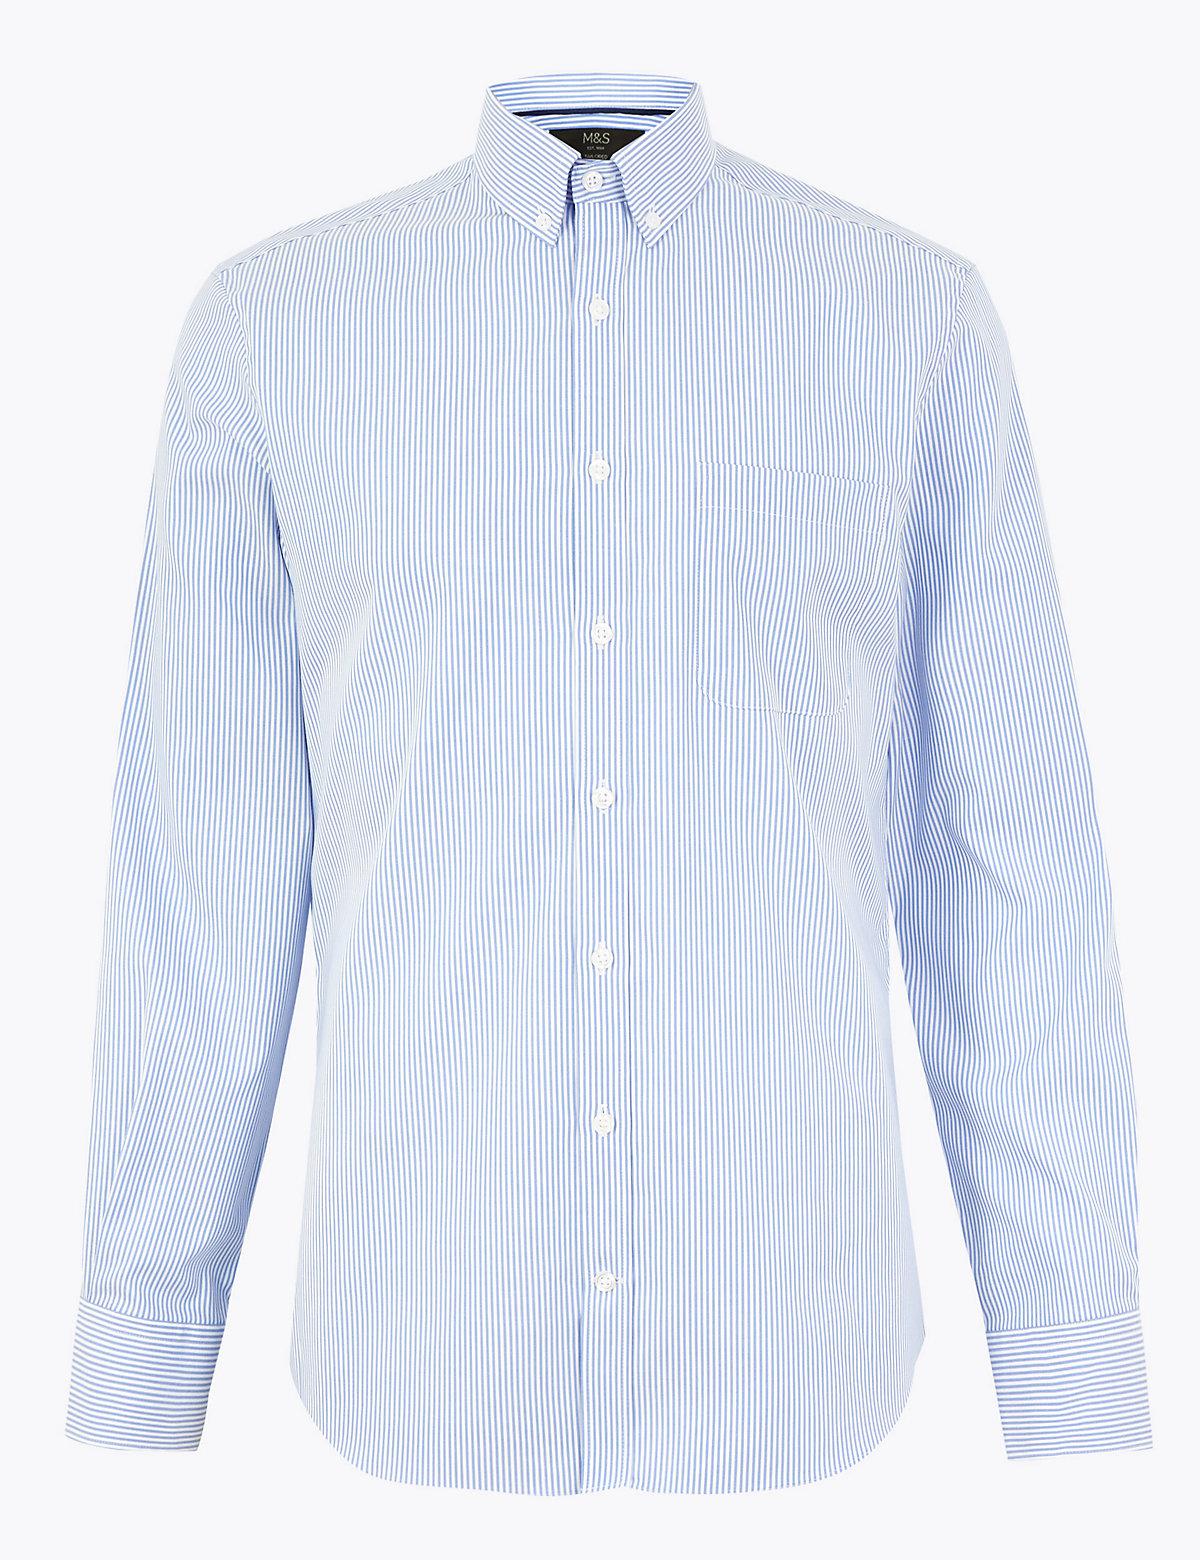 Рубашка по фигуре в полоску с технологией Easy Iron